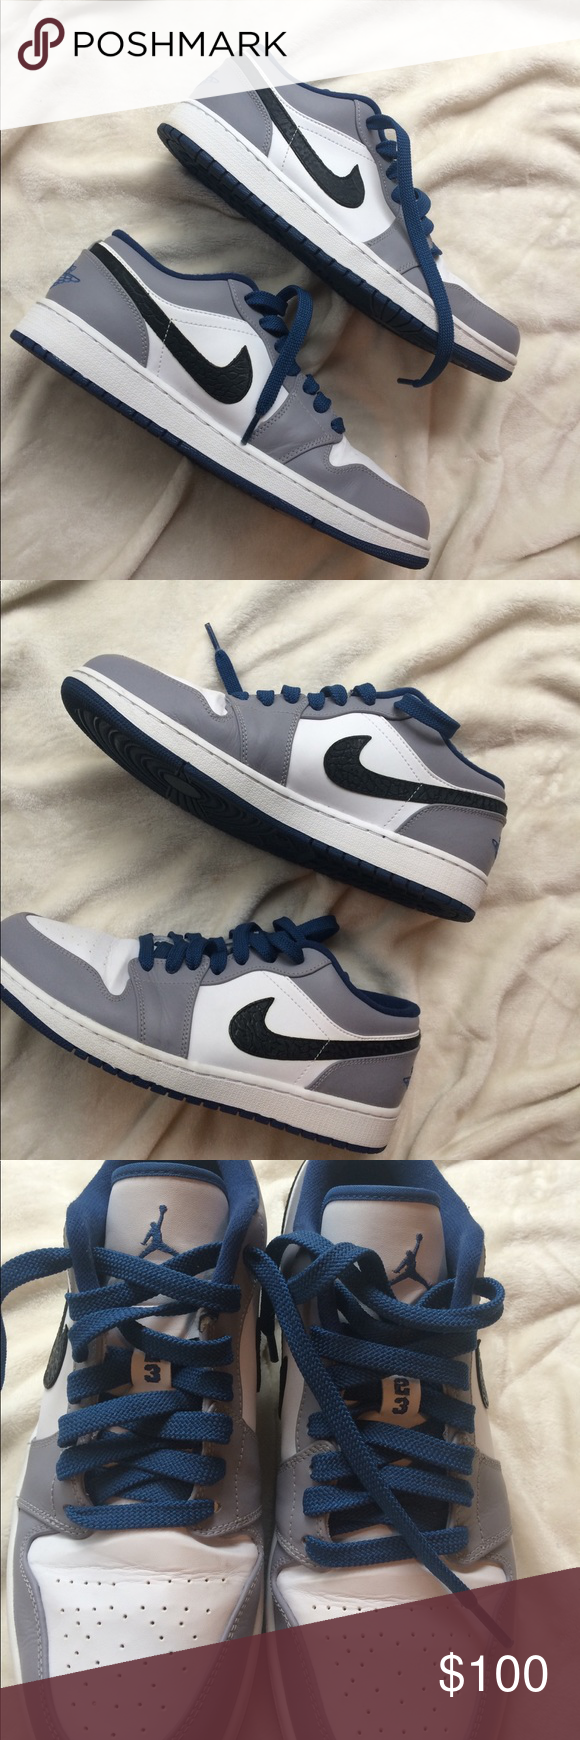 952a02320a Nike Air Jordan 1 Low Gray, White, & Blue These are Nike Air Jordans ...